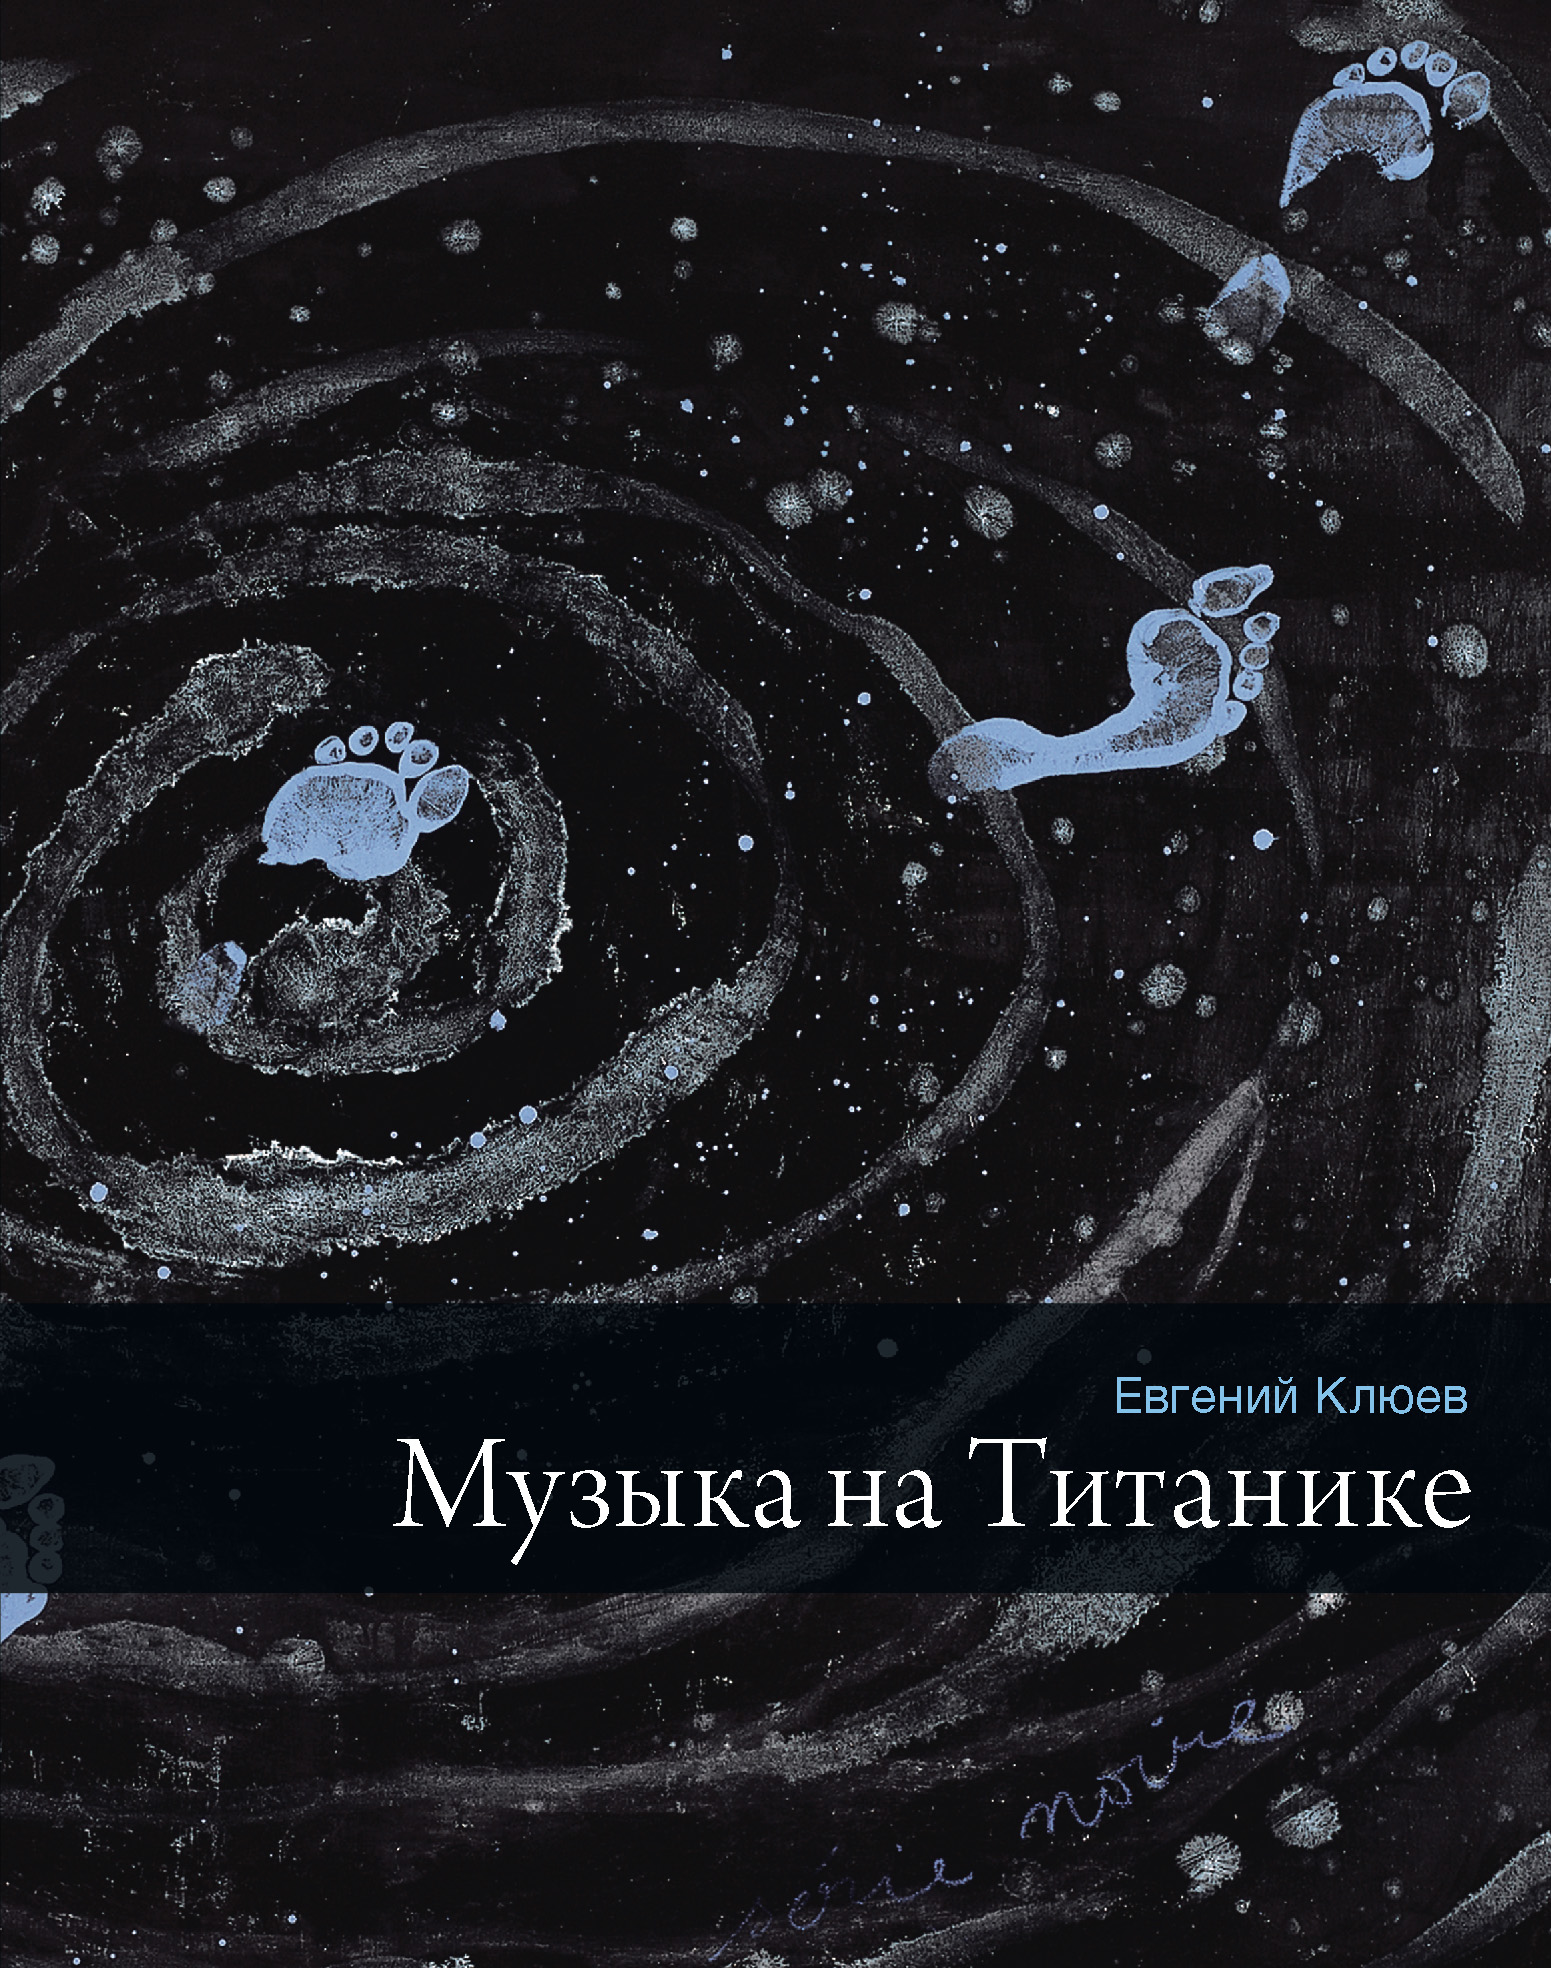 Евгений Клюев Музыка на Титанике (сборник)